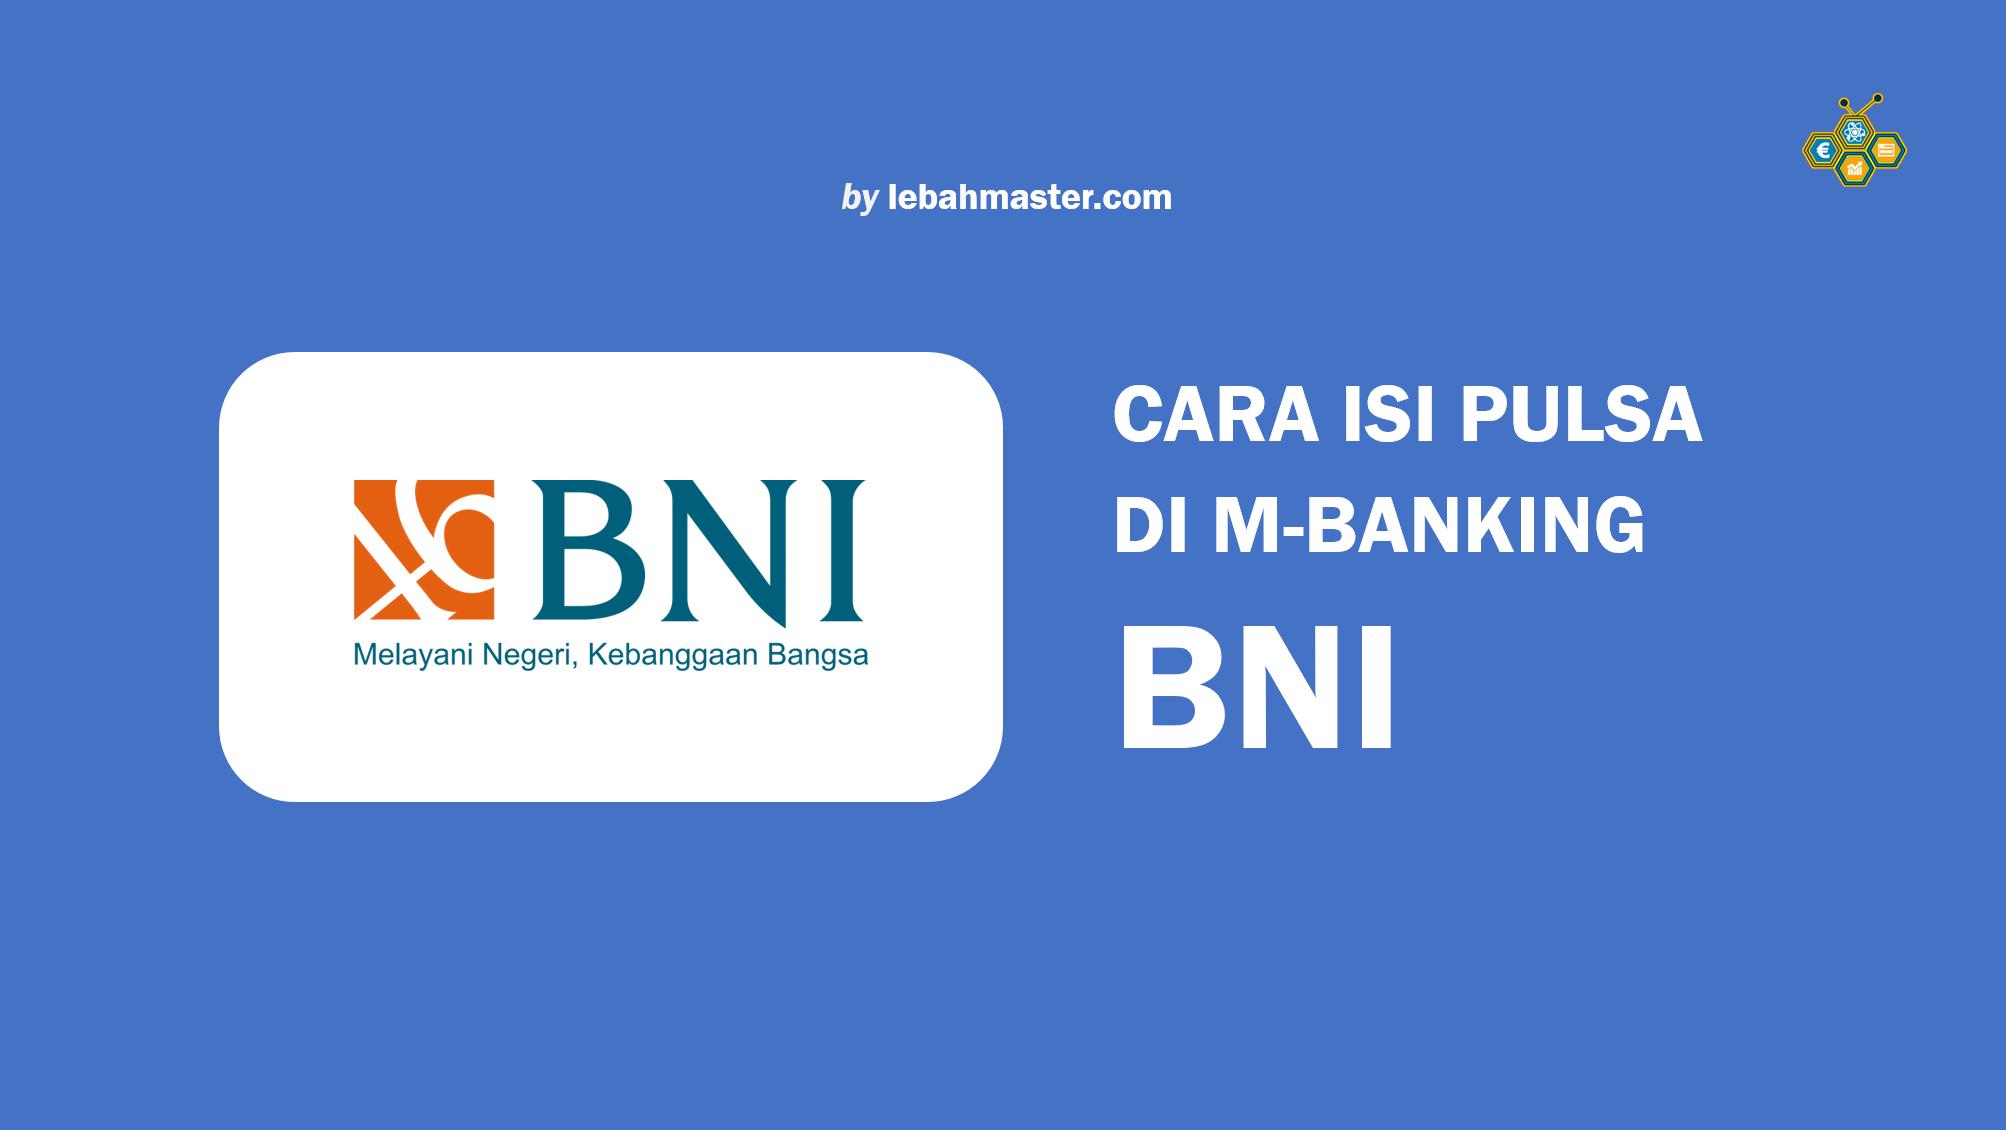 Cara Isi Pulsa Di M-Banking BNI